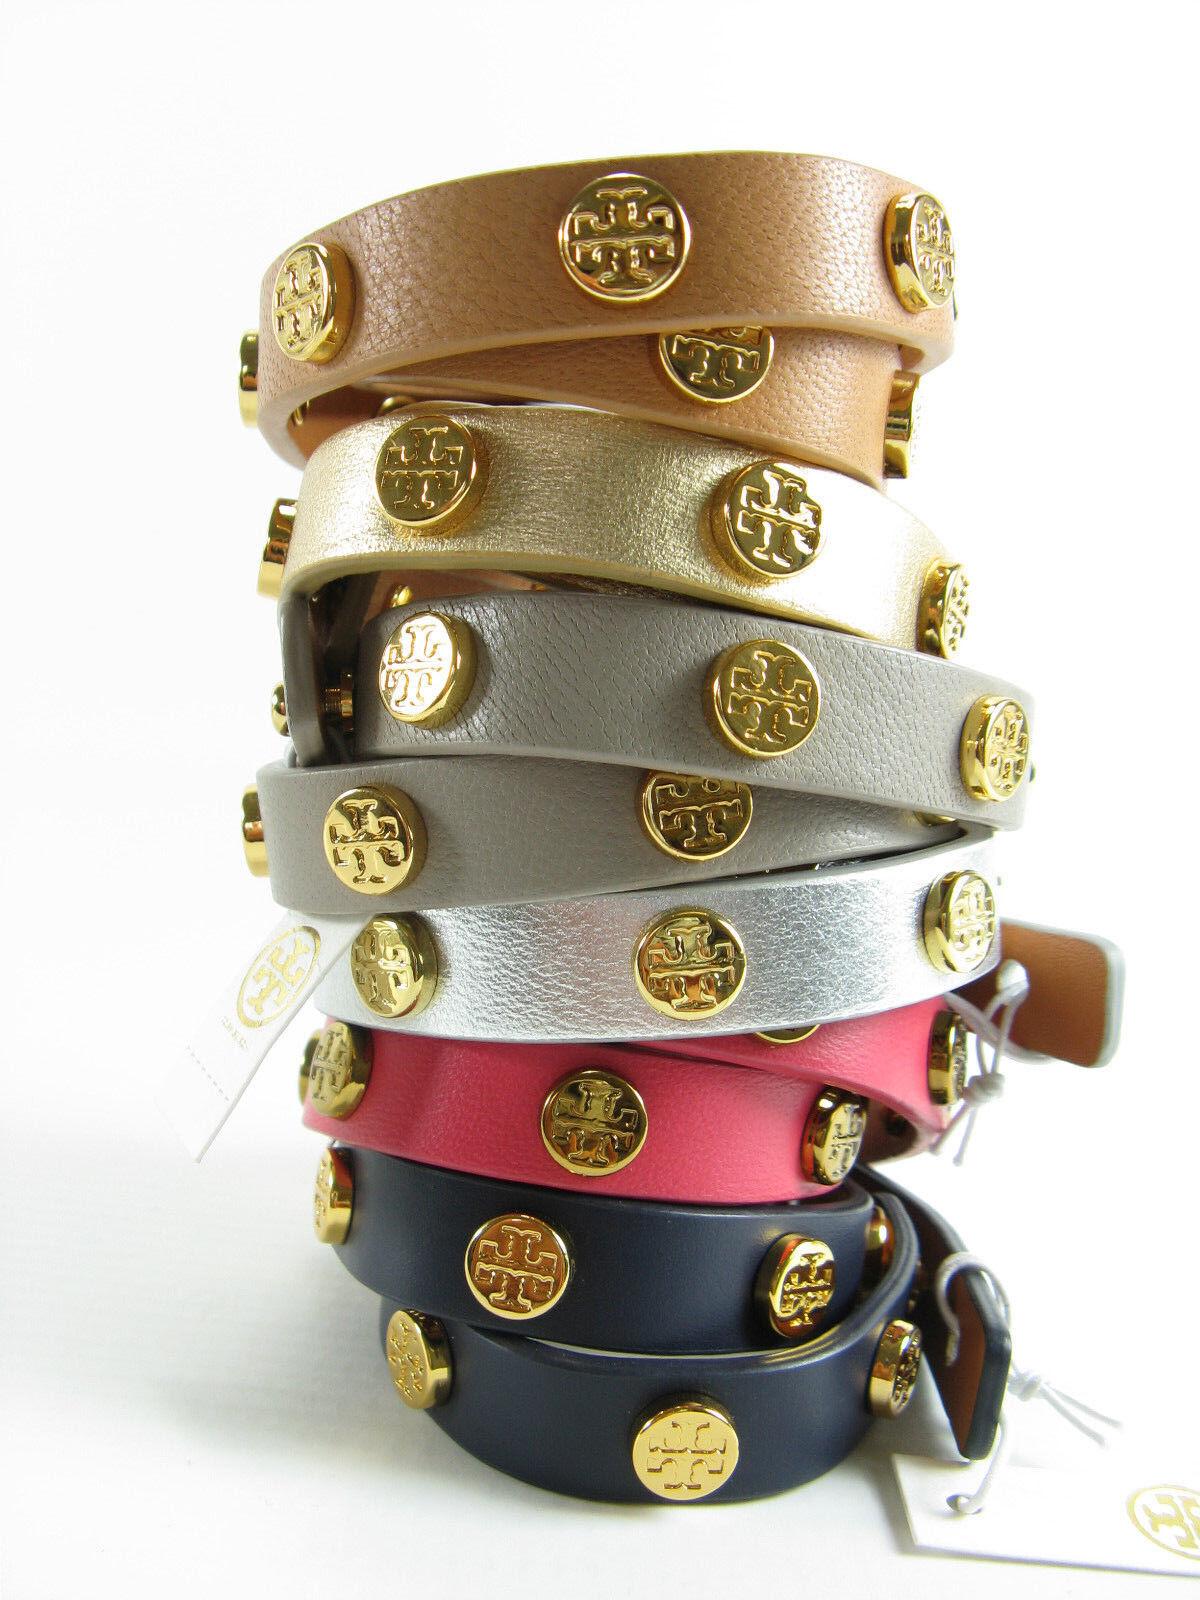 NWT Tory Burch Leather Double Wrap Logo Stud Bracelet AUTH  95